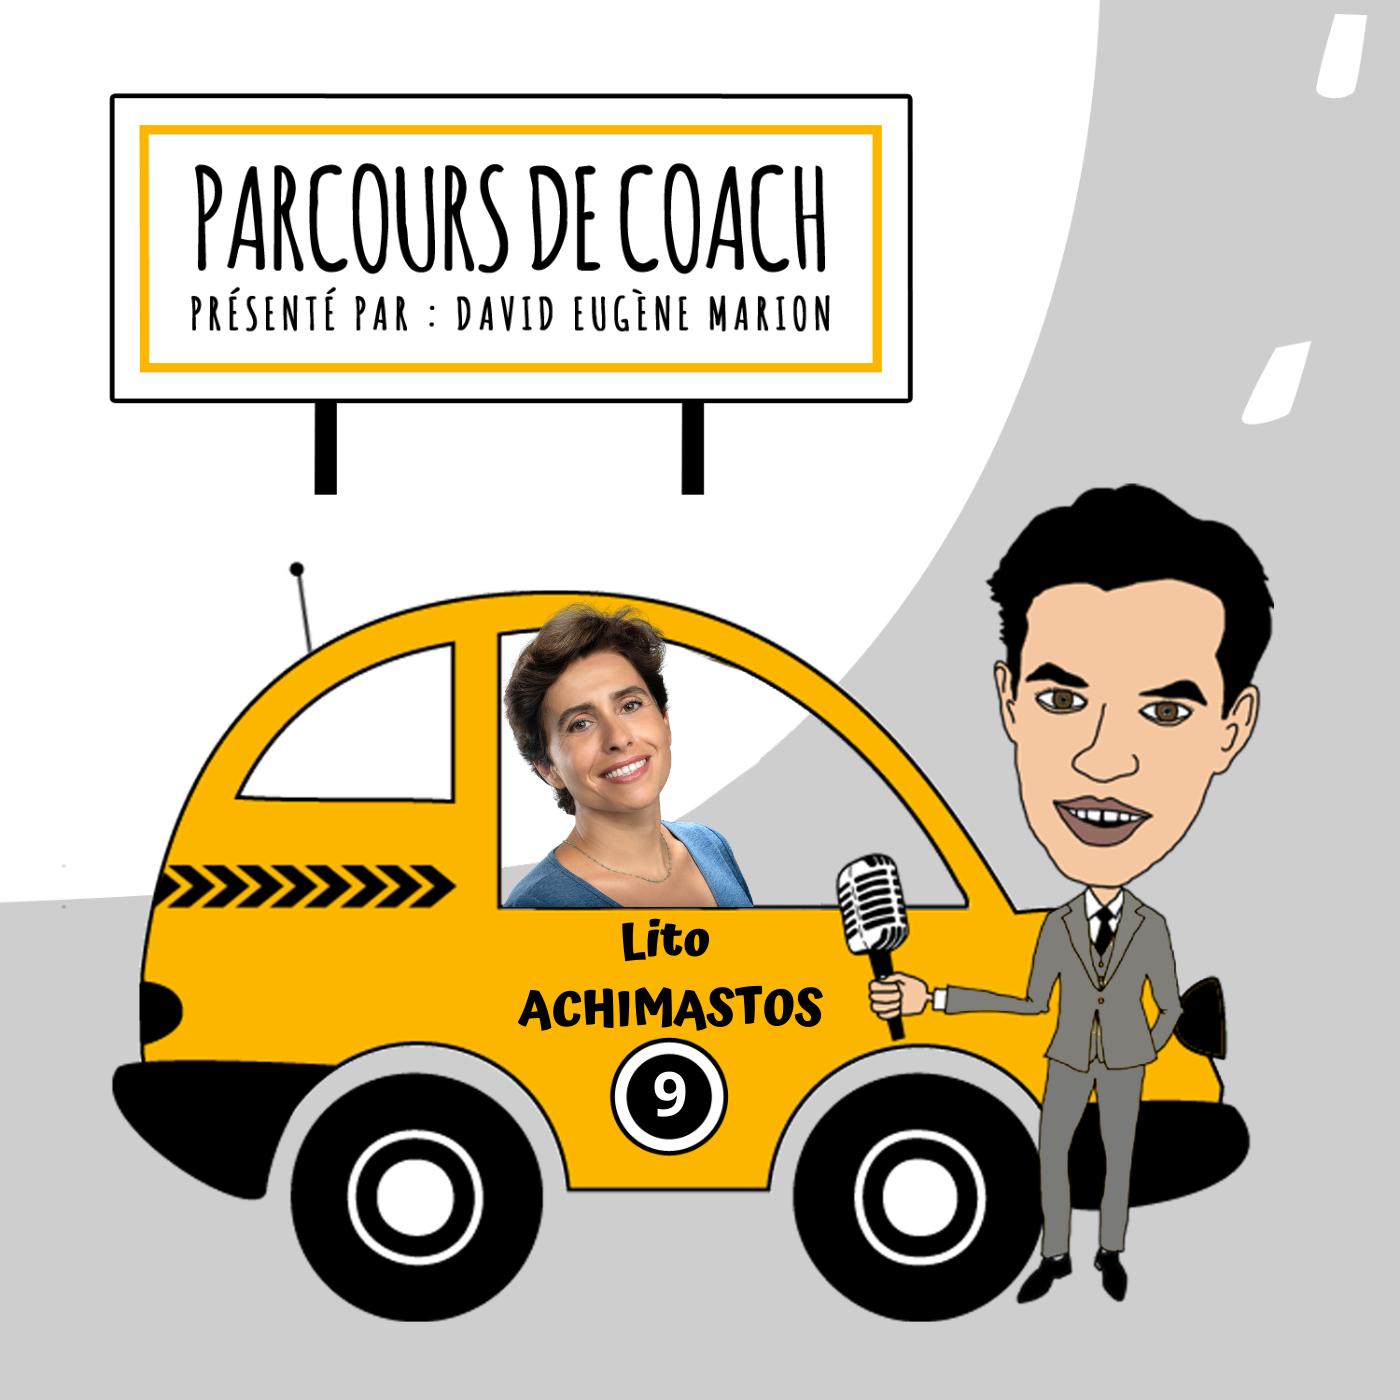 Parcours de Coach® n°9 : Lito ACHIMASTOS